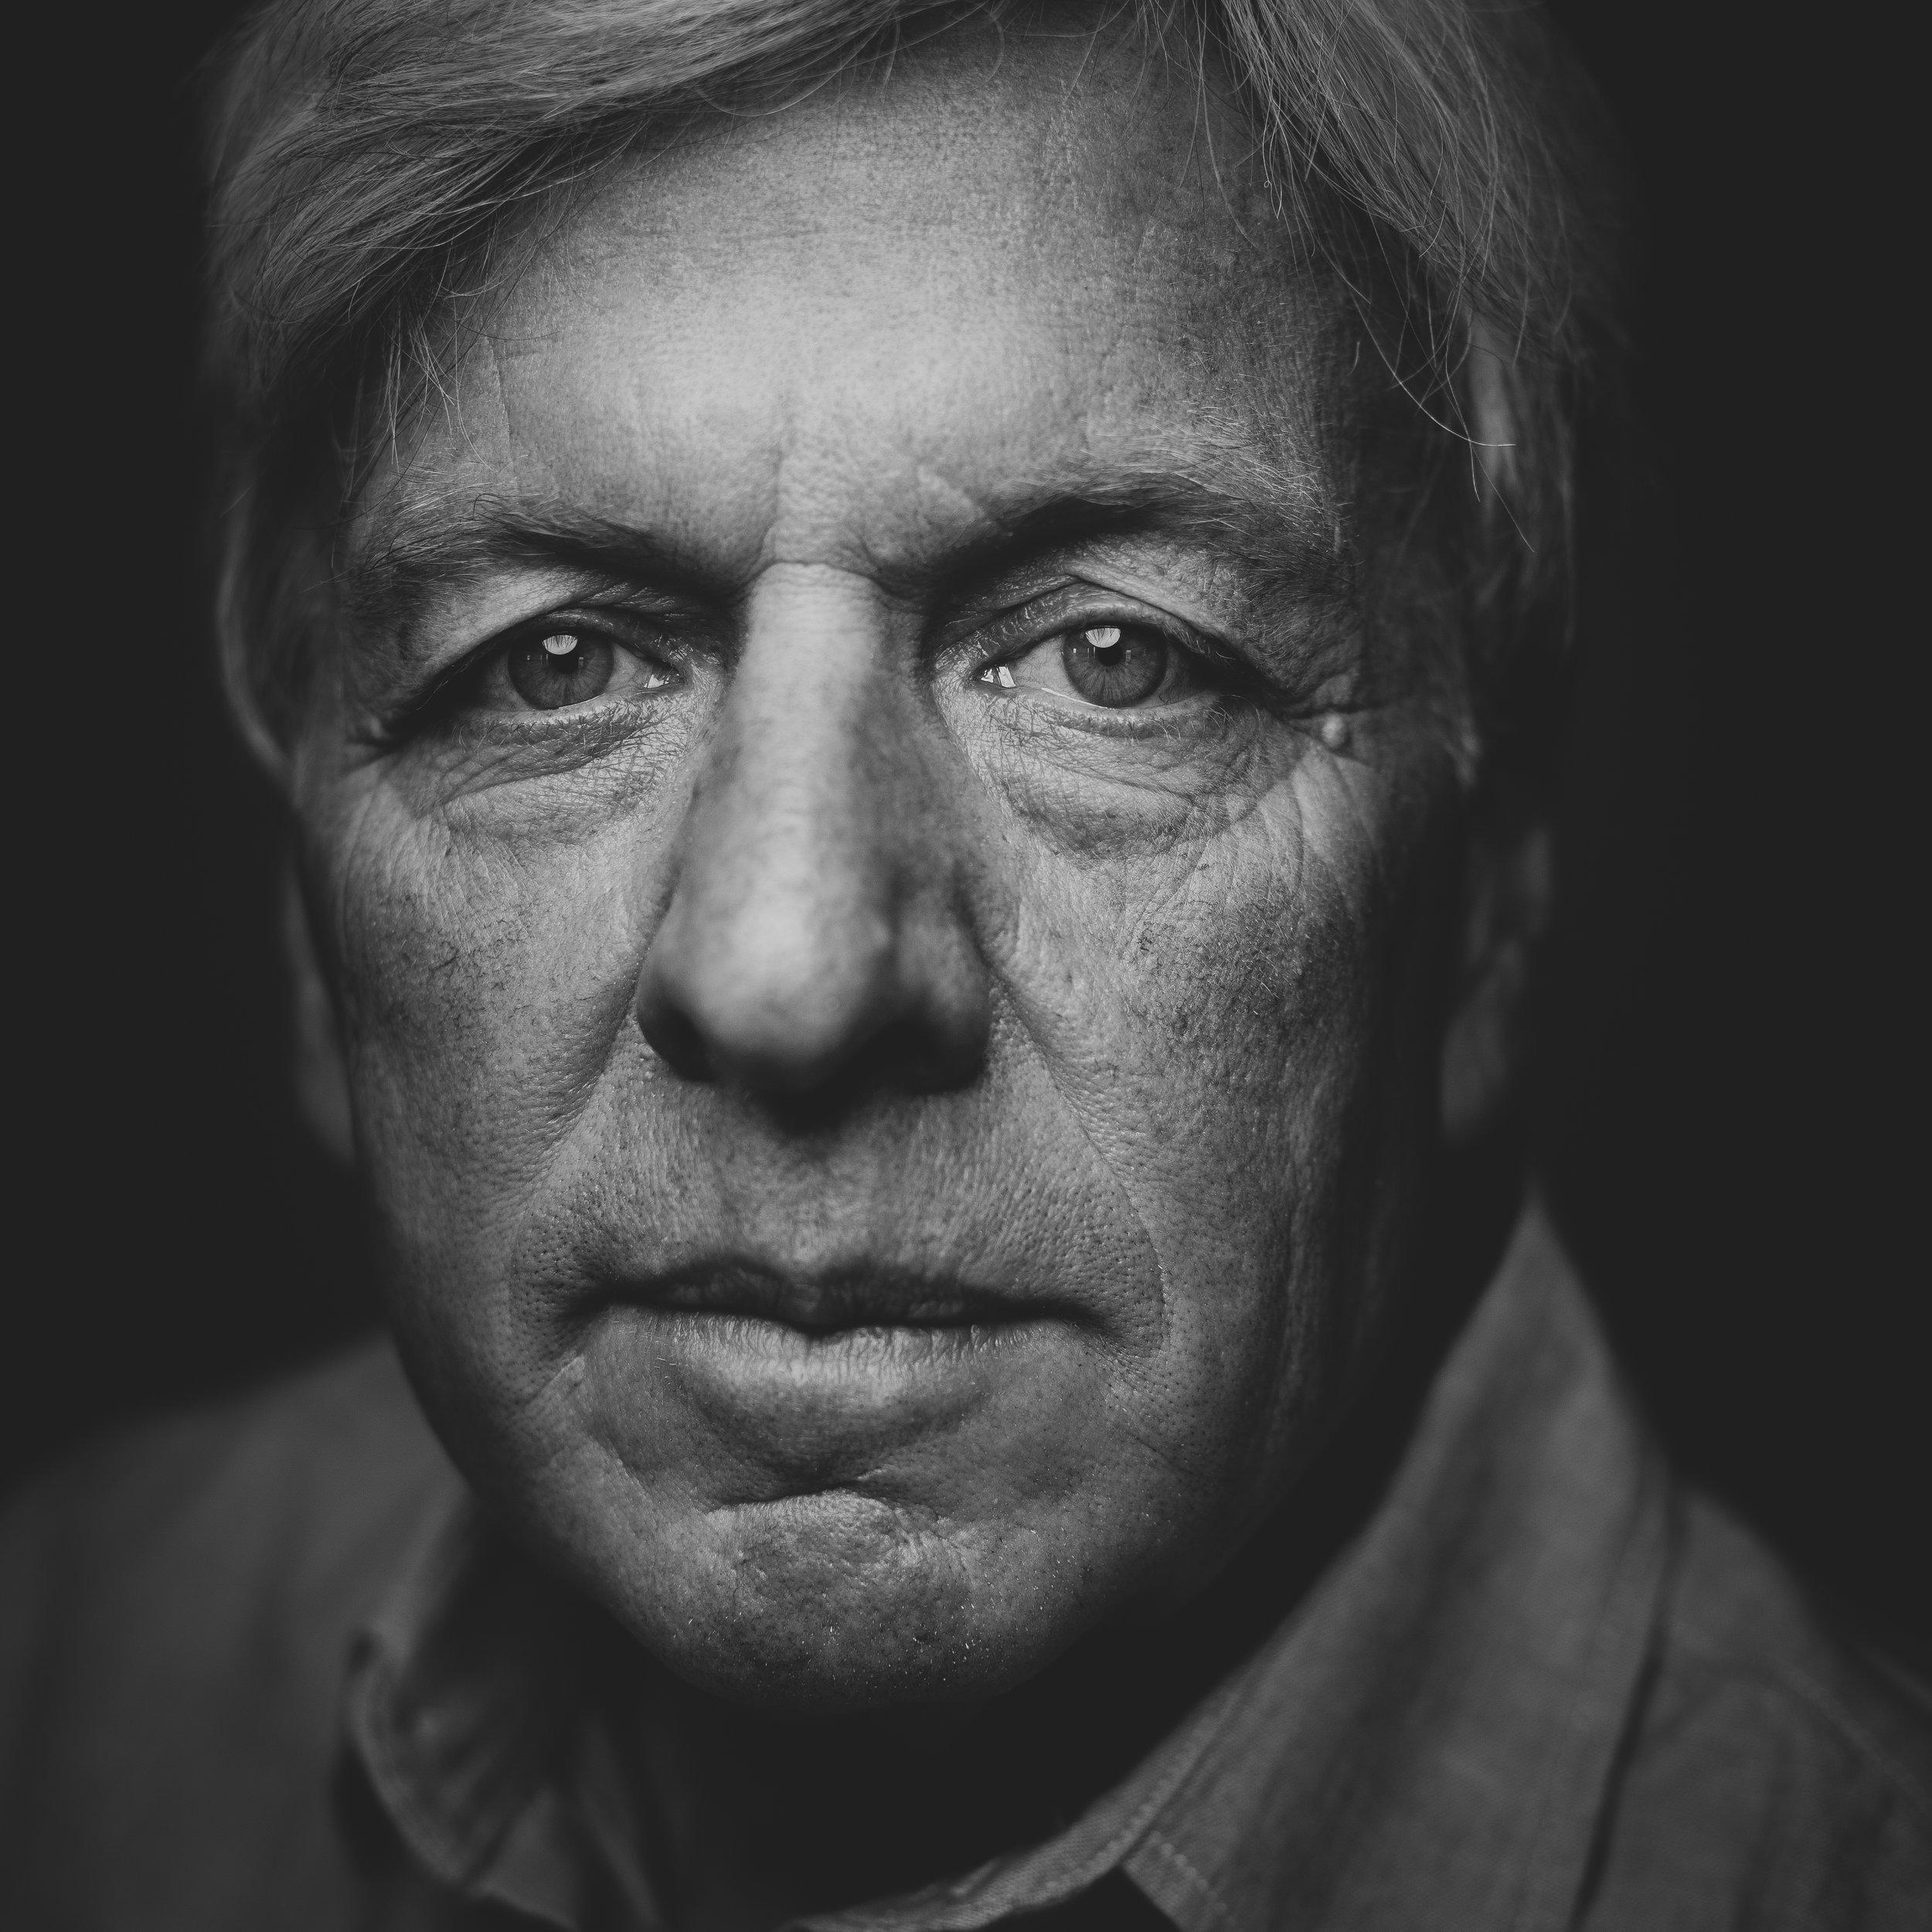 ©duston-todd-portrait-closeup-man-black-white.jpg